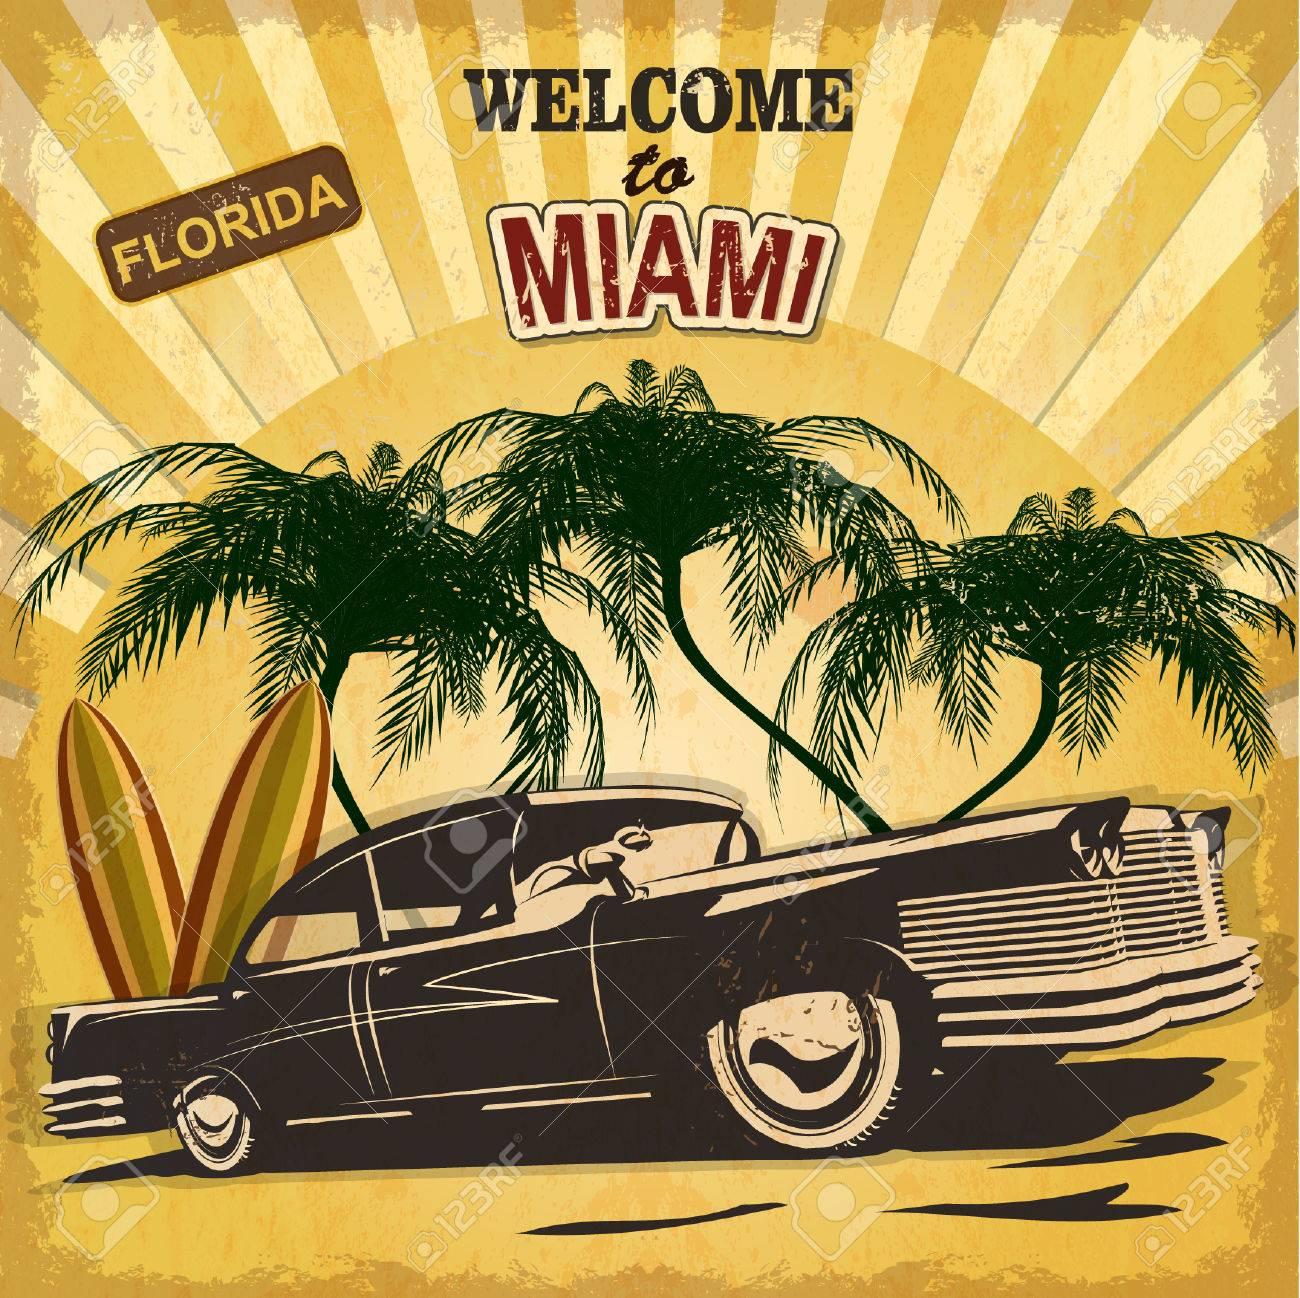 Welcome to Miami retro poster. - 50494392